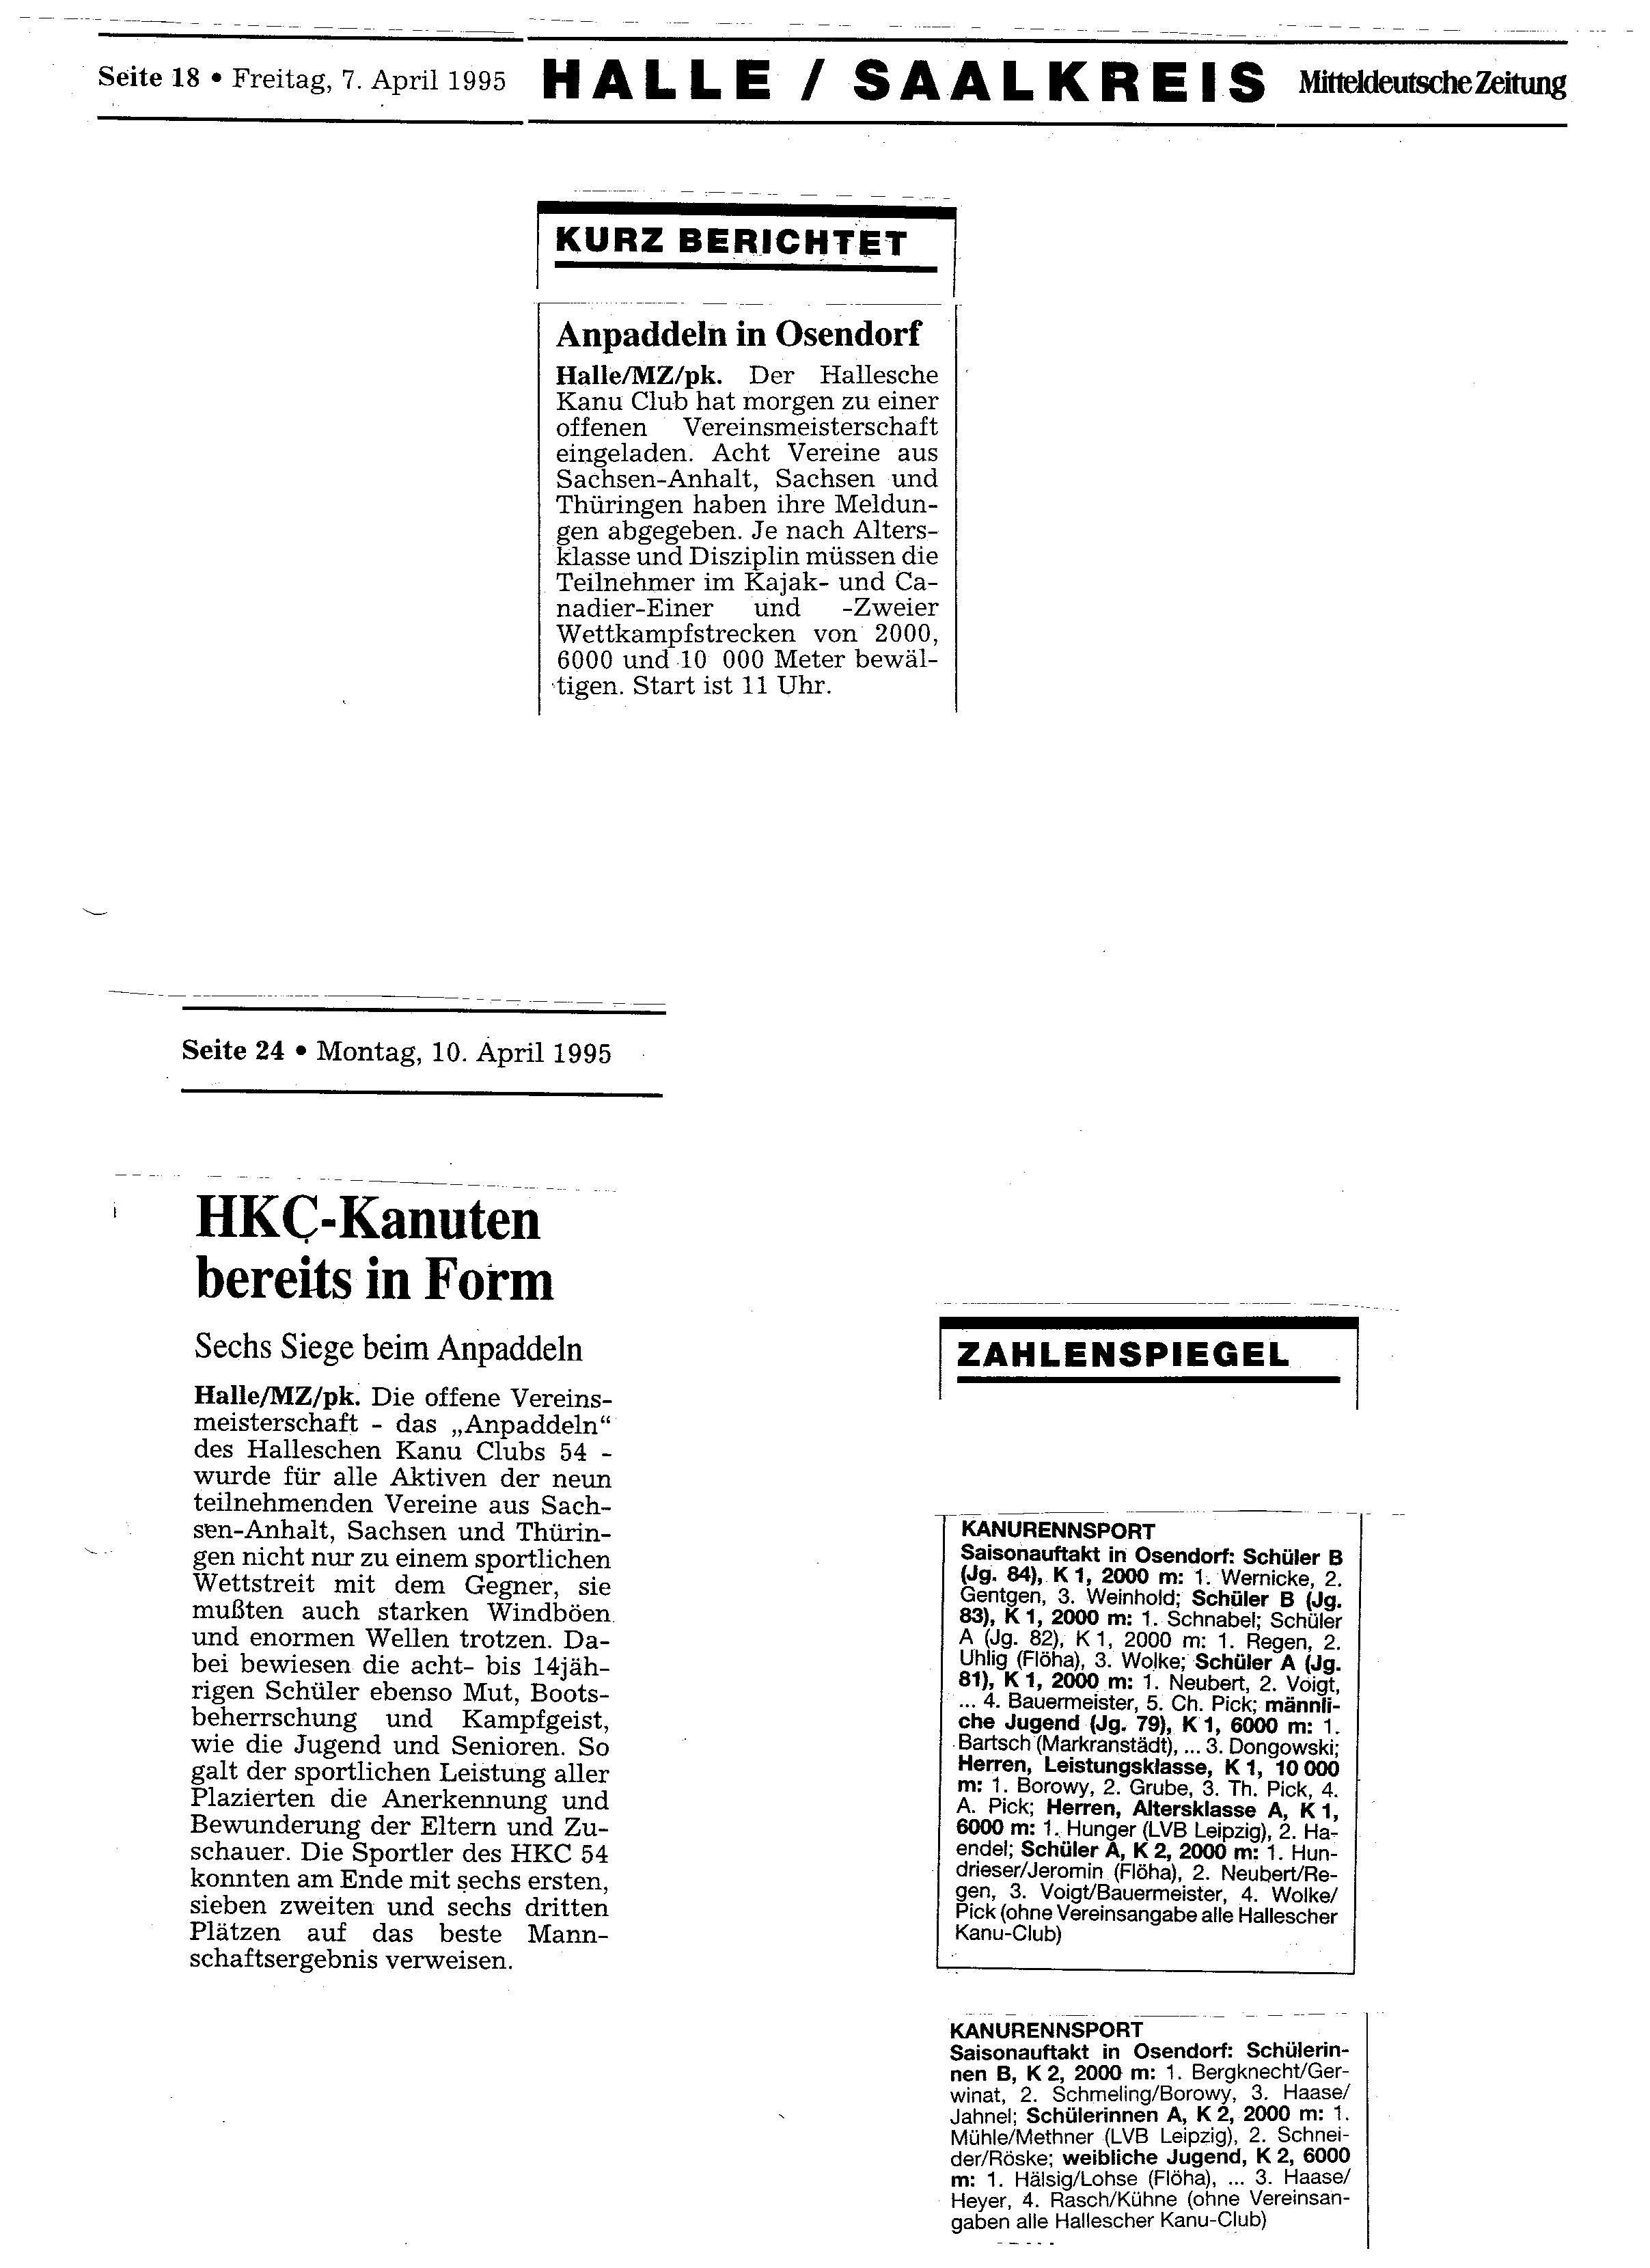 1995-04-07 MZ anpaddeln in Osendorf, HKC Kanuten bereits in Form